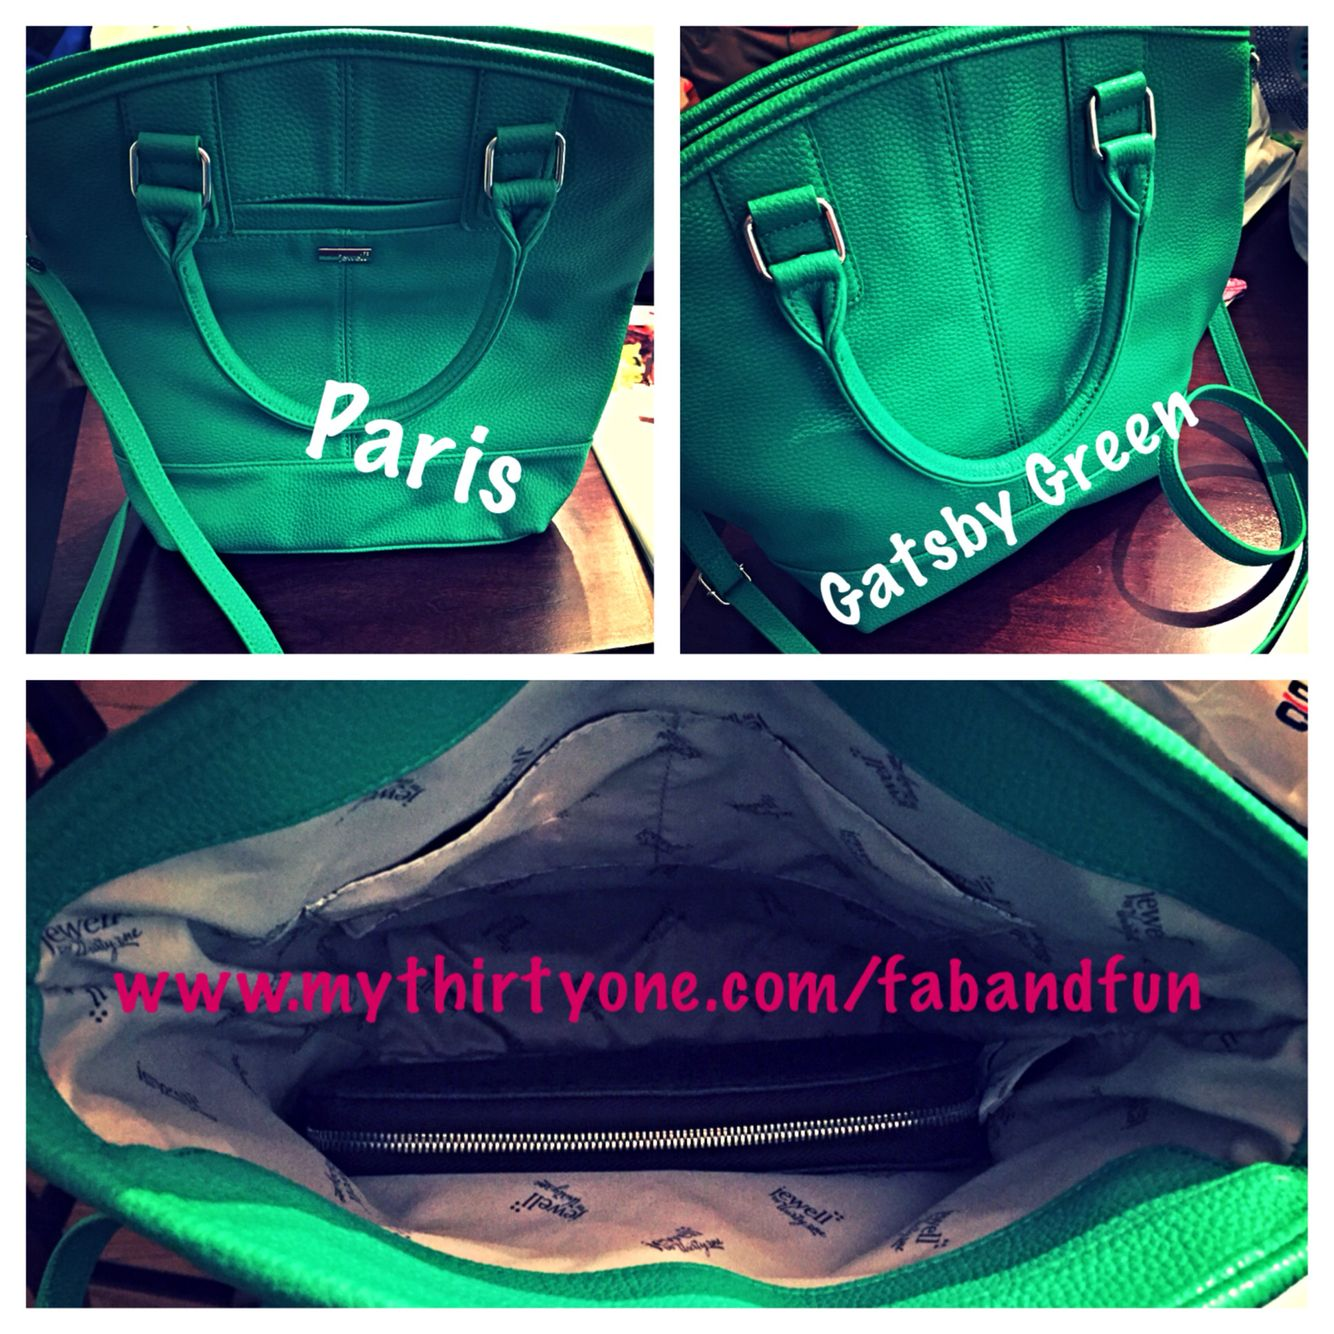 New Jewell by Thirty-One, Paris in Gatsby Green. www.mythirtyone.com/fabandfun #spring2015 #thirtyone #fabandfun